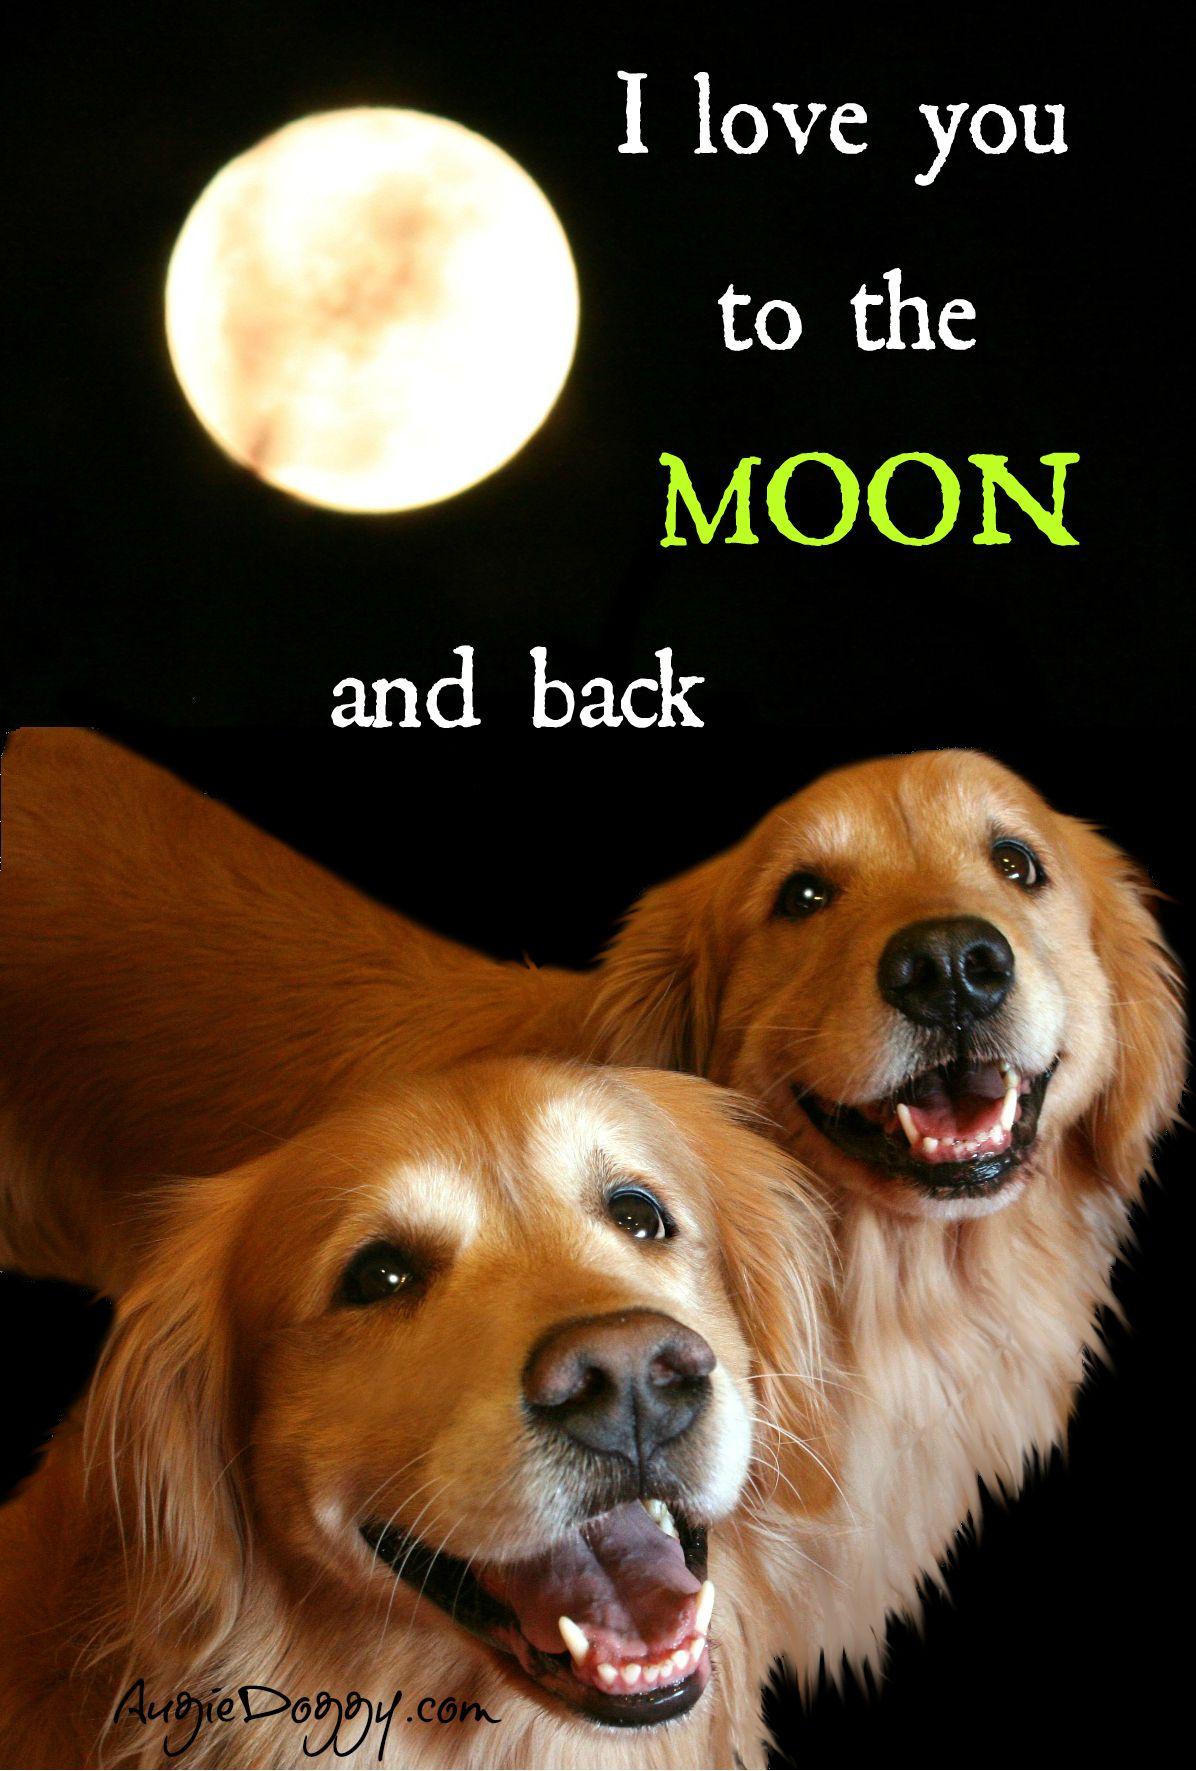 Http Www Augiedoggy Com Apps Blog Dogs Golden Retriever Dog